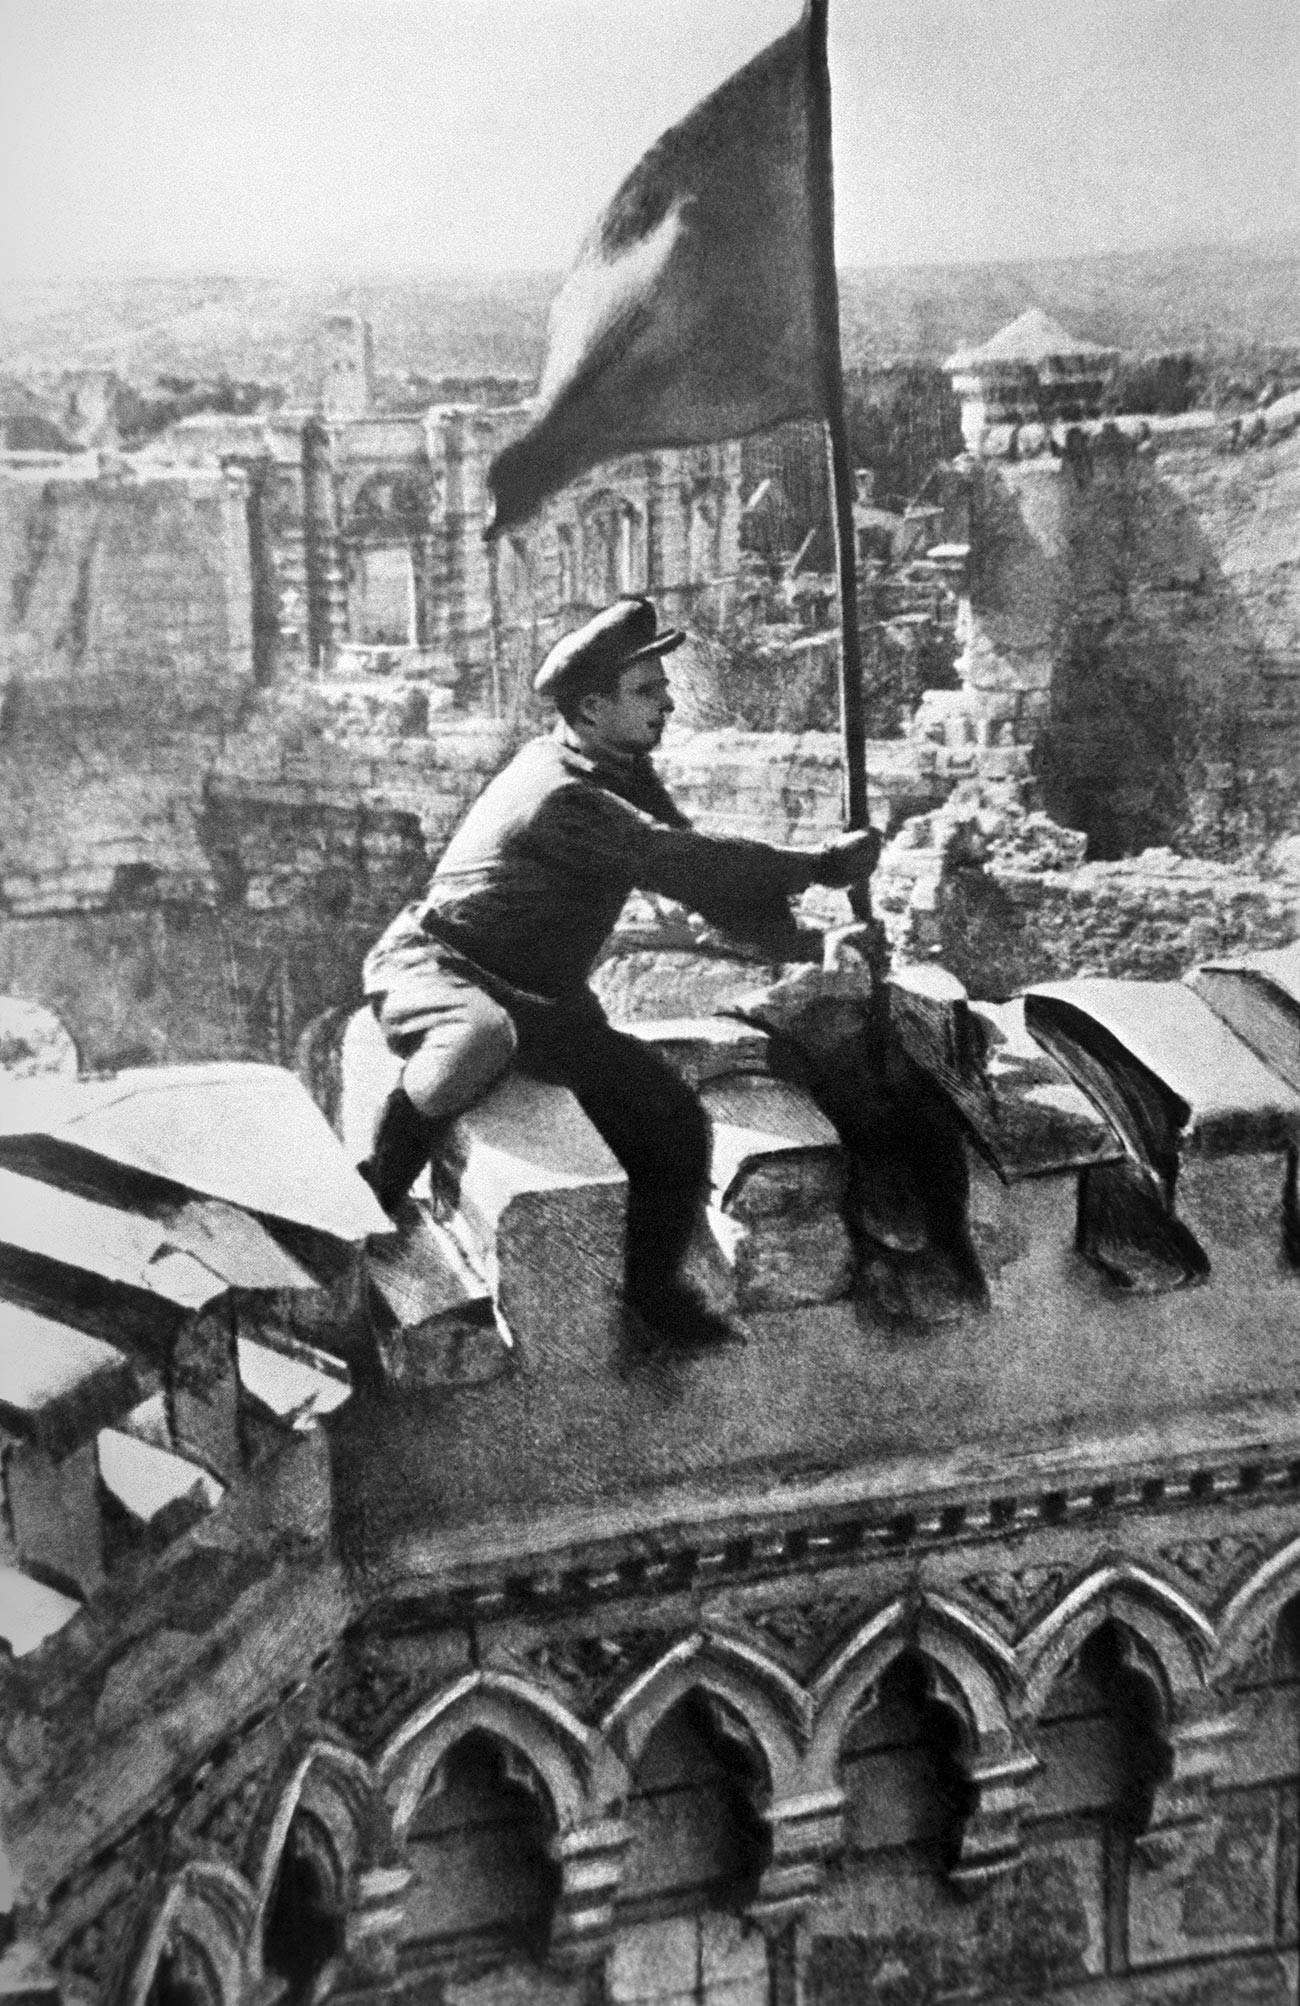 Razobešanje prapora zmage nad osvobojenim Kišinjevom, 1944